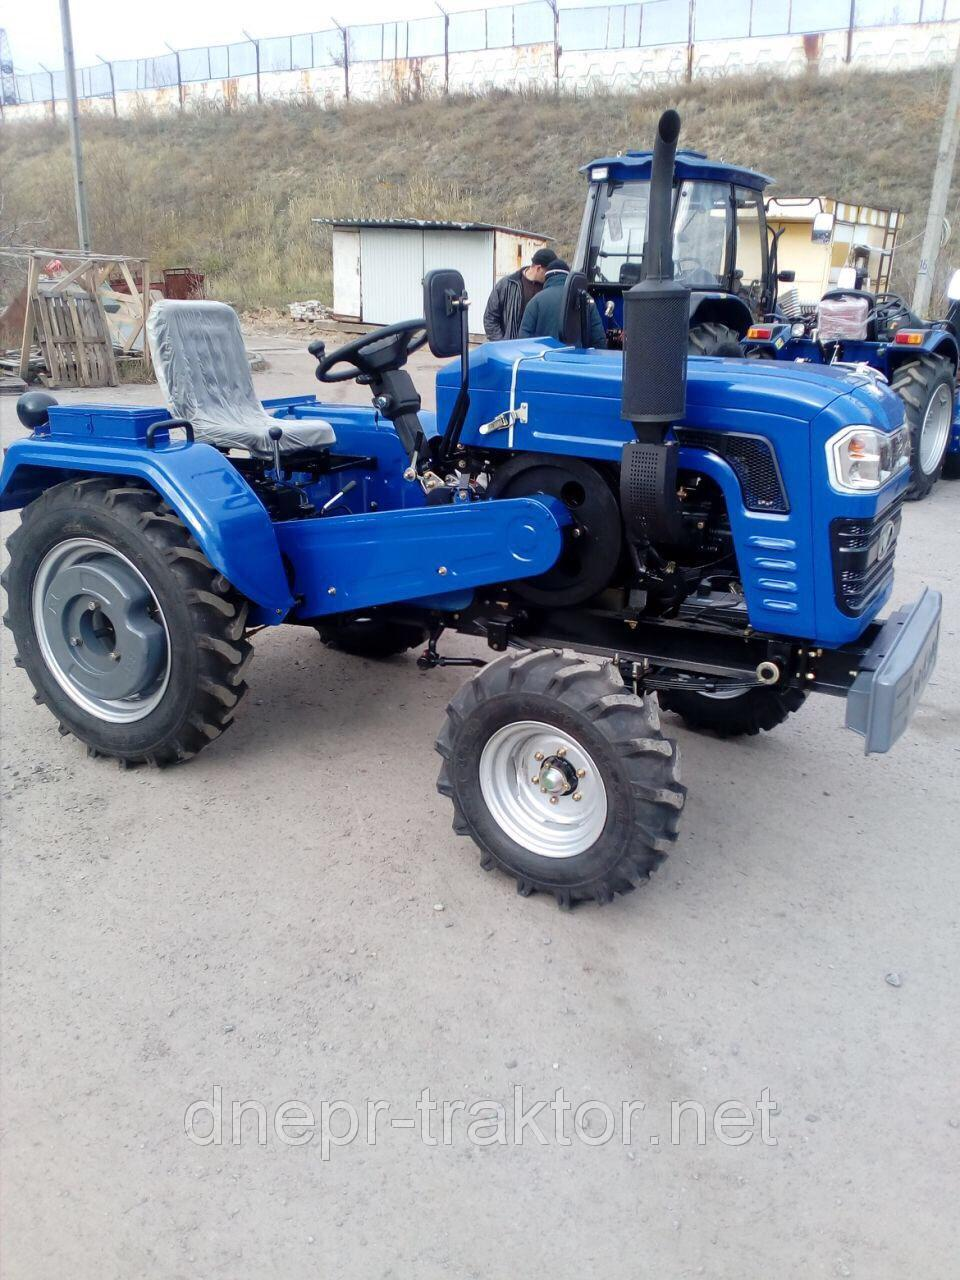 Трактор DW 244B ременной привод (24 л.с. 4х4 1 цил.)